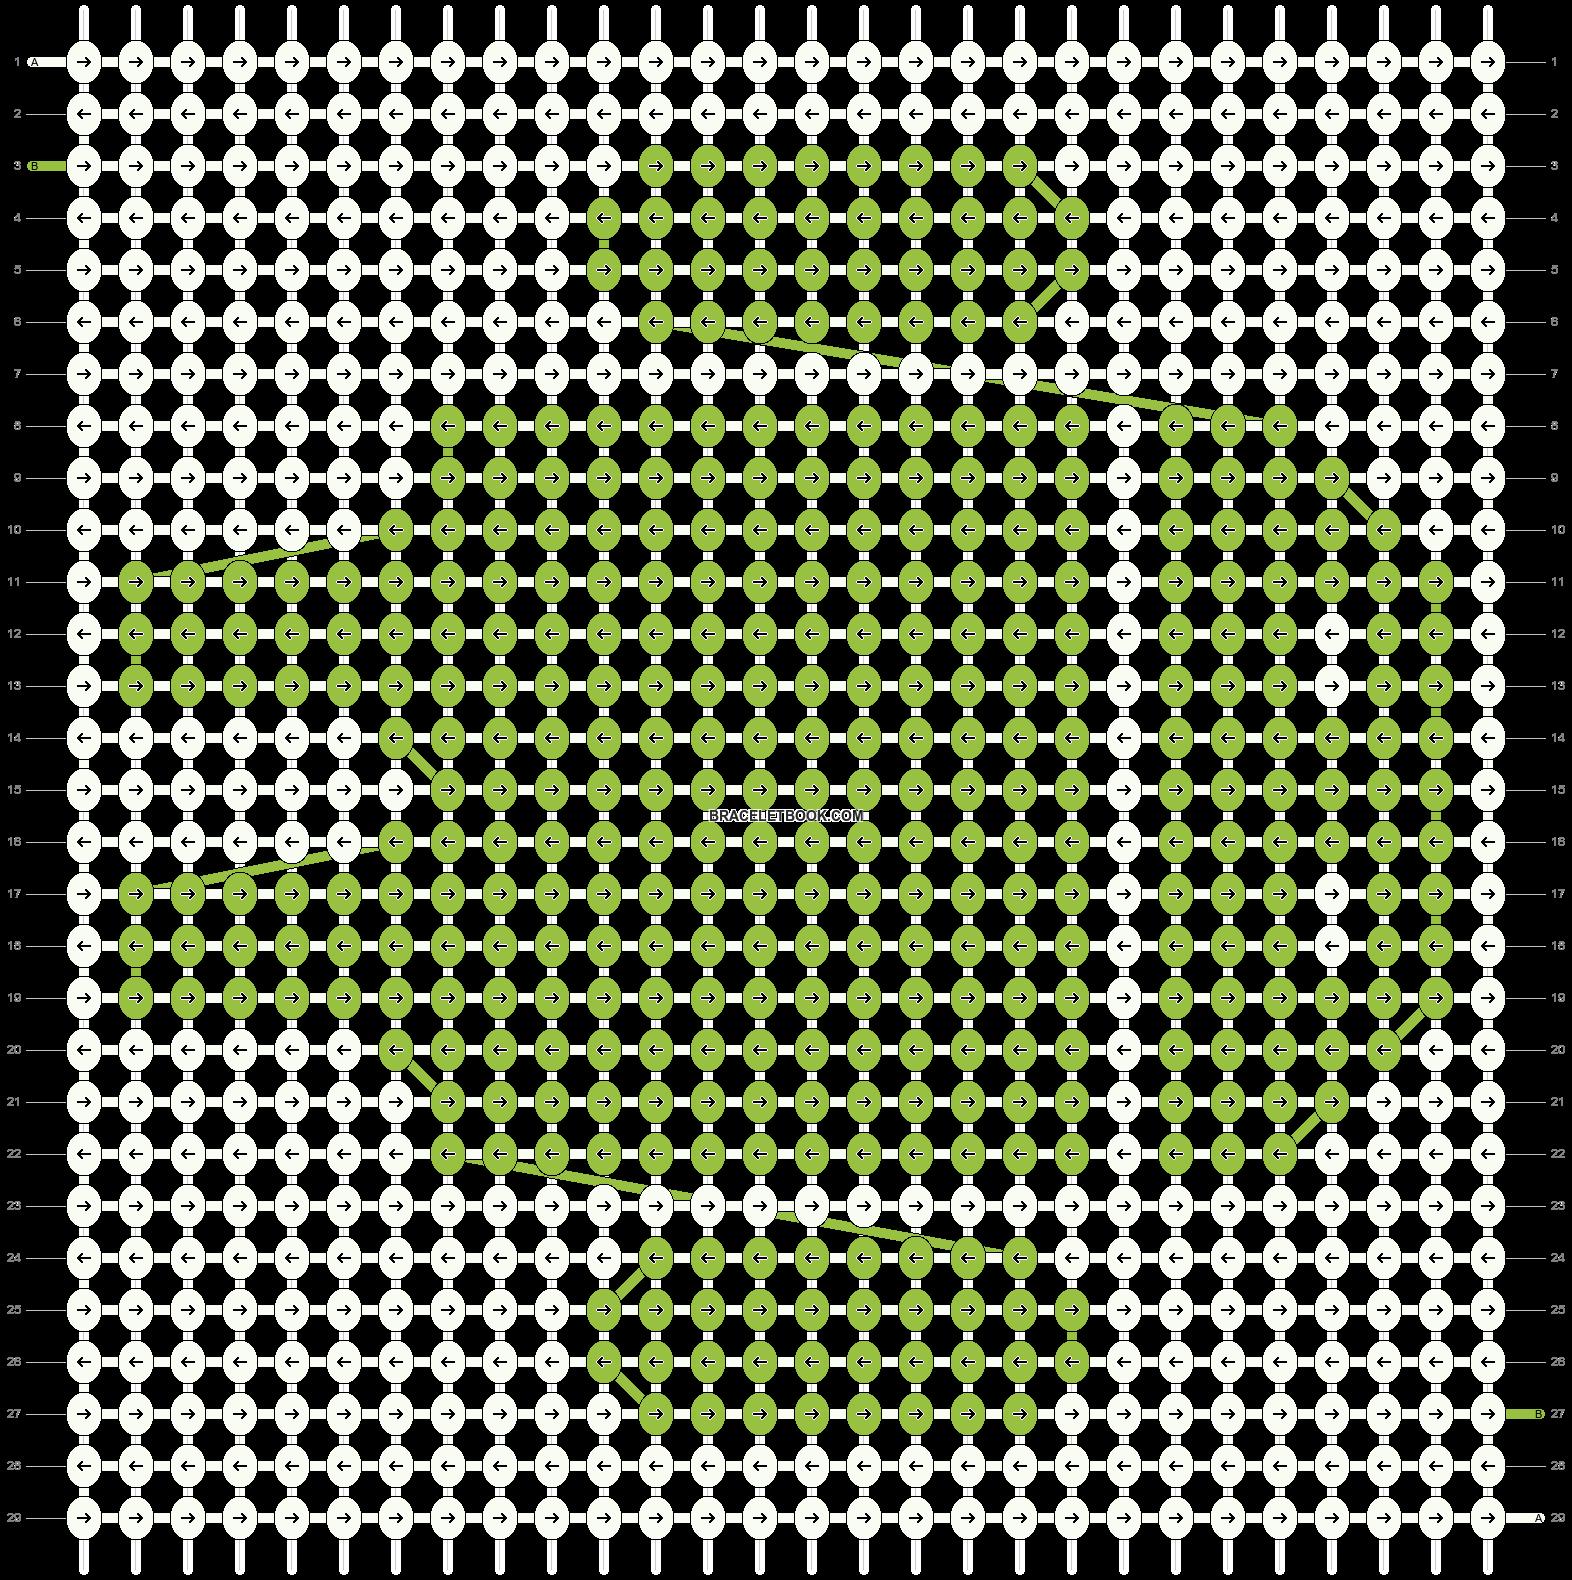 Alpha pattern #550 pattern